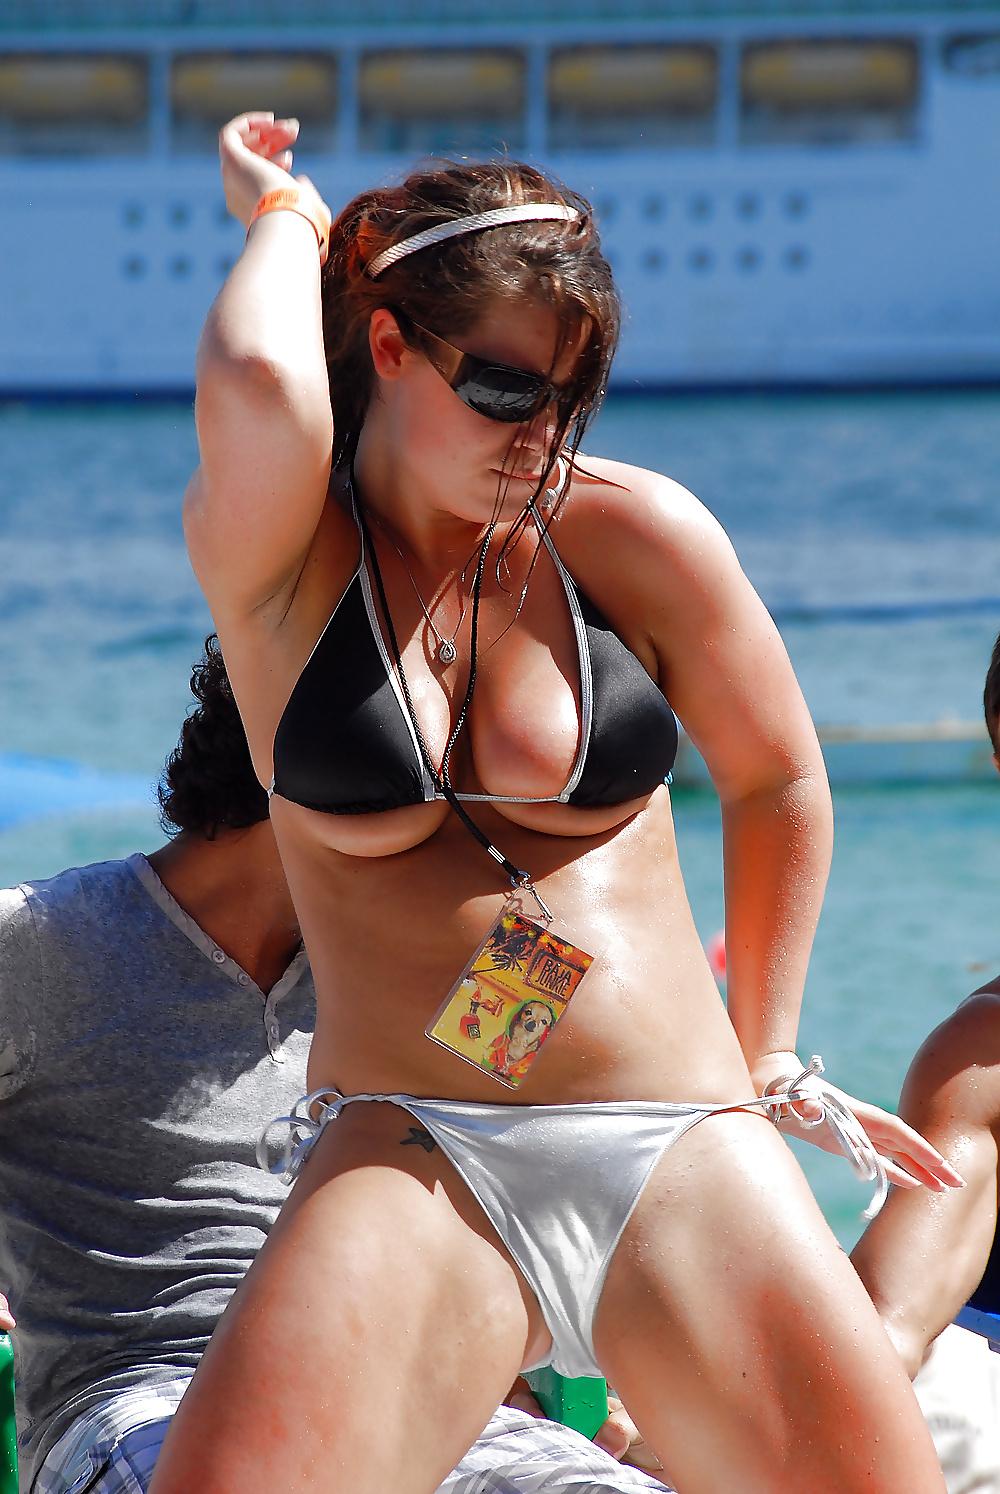 bikini-nipples-tits-giving-backseat-blowjobs